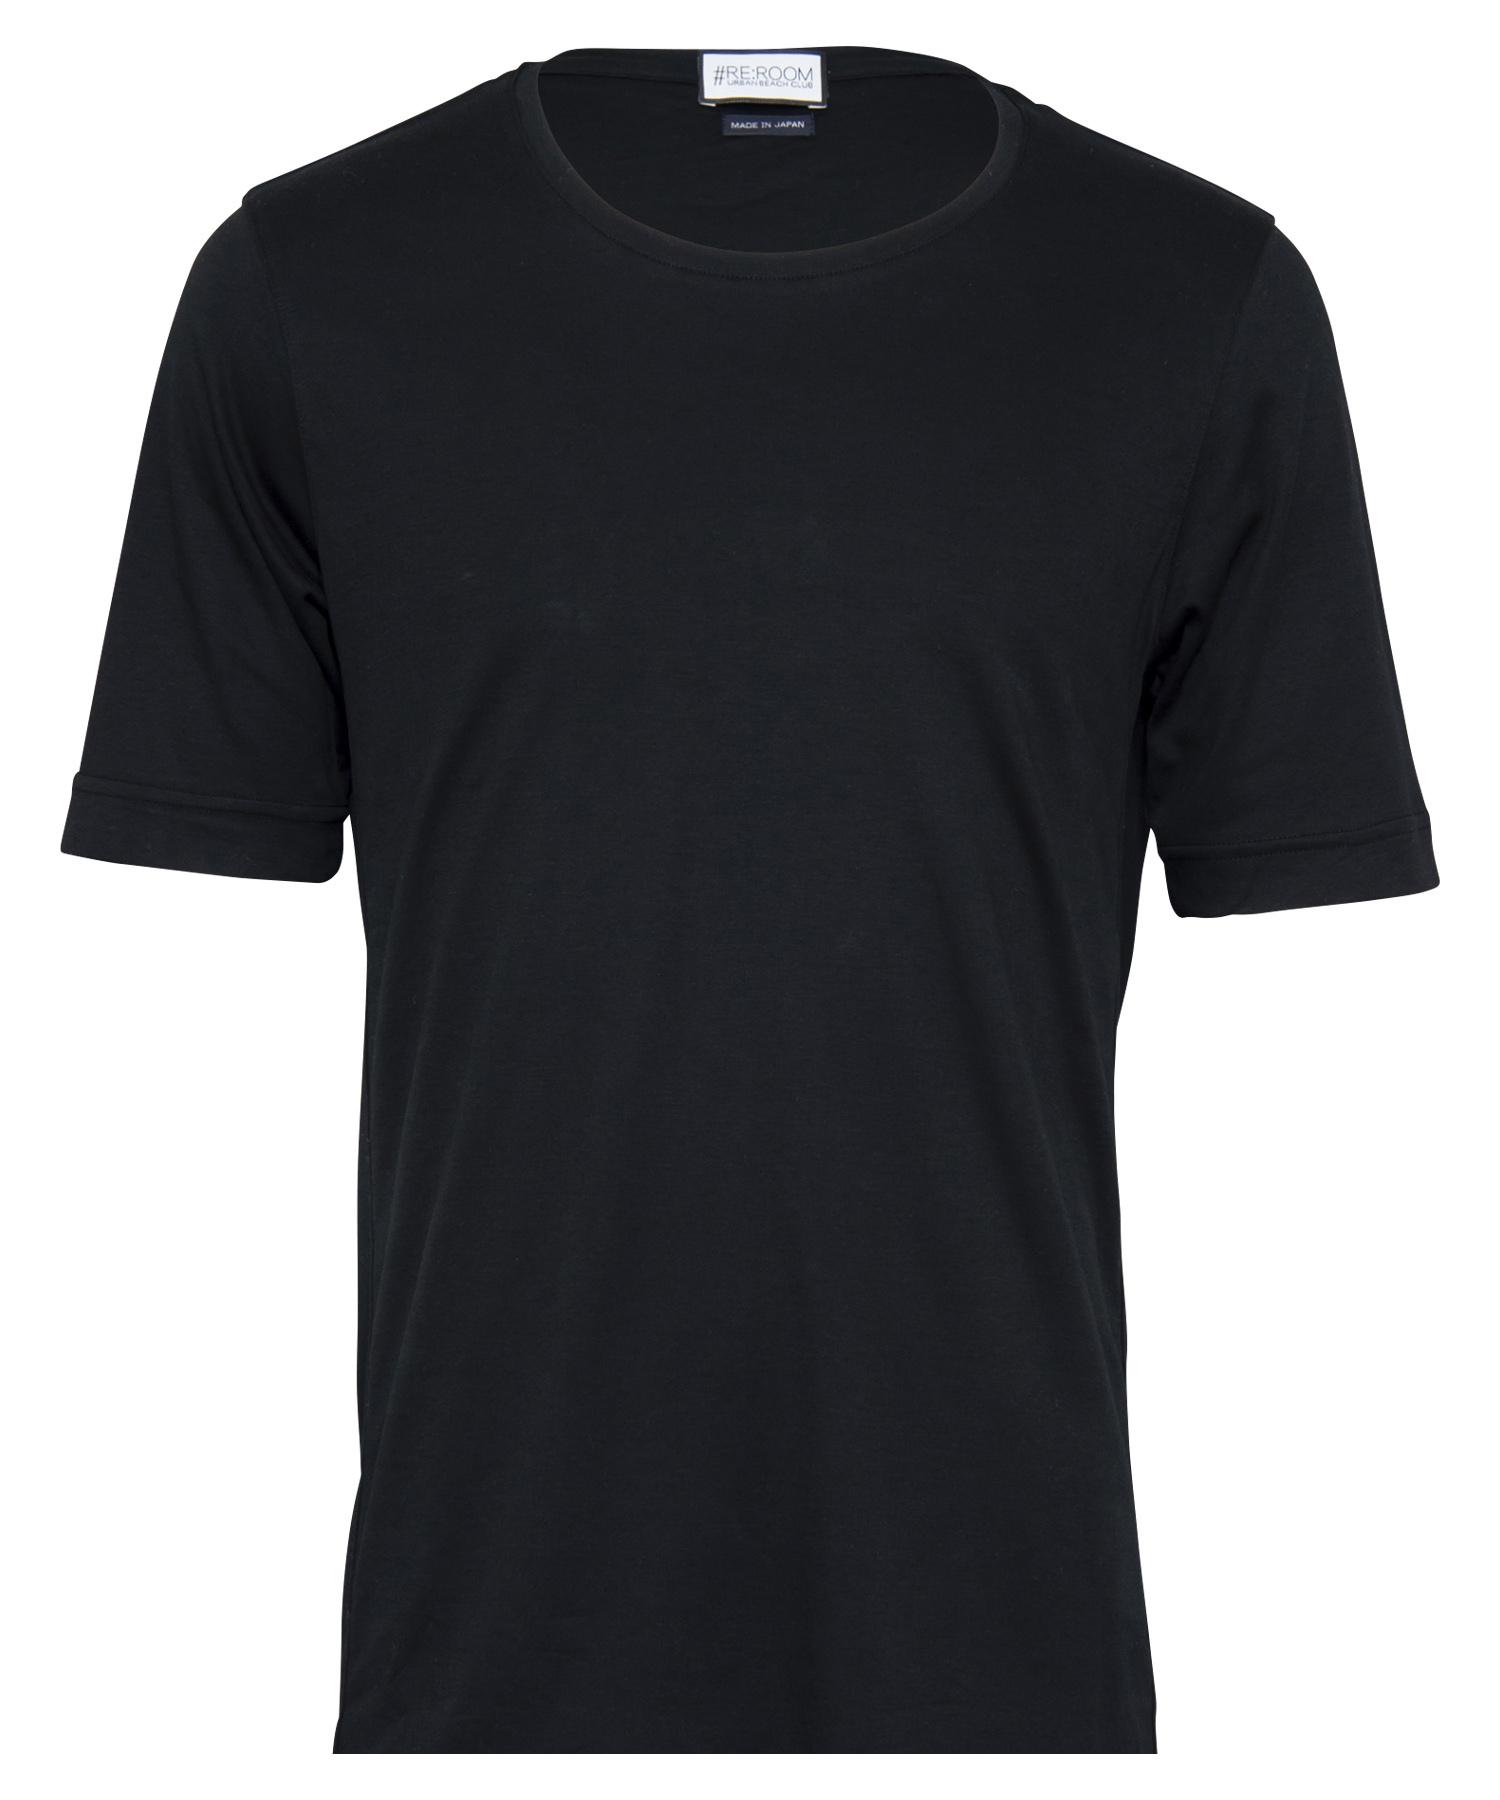 PREMIUM COTTON DRESS CREW NECK T-shirts[RUC001]